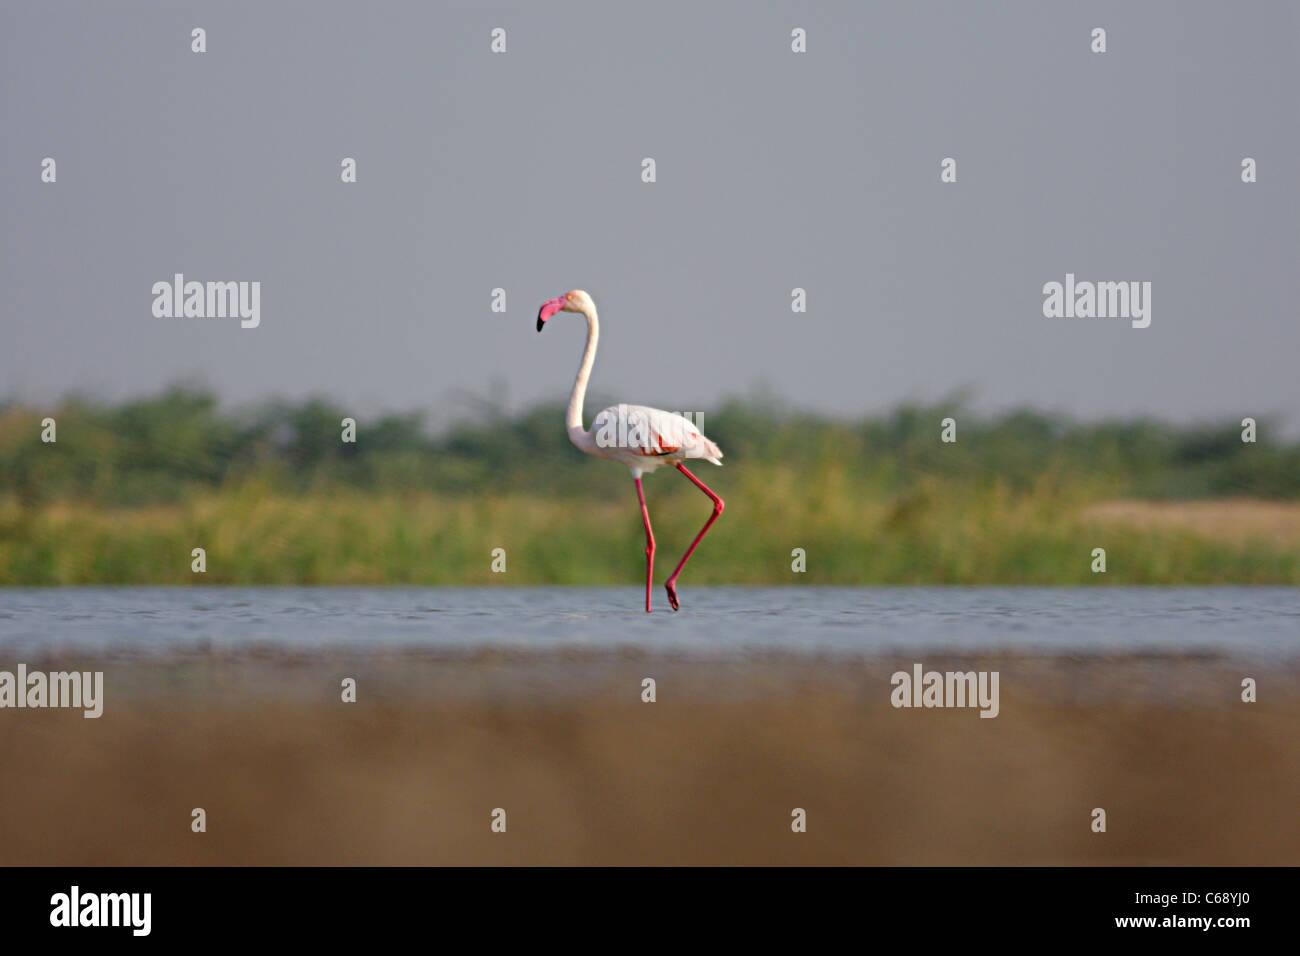 Greater Flamingo (Phoenicopterus roseus) At  Dasada, Surendranagar, Little Rann of Kutch,  Gujarat - Stock Image